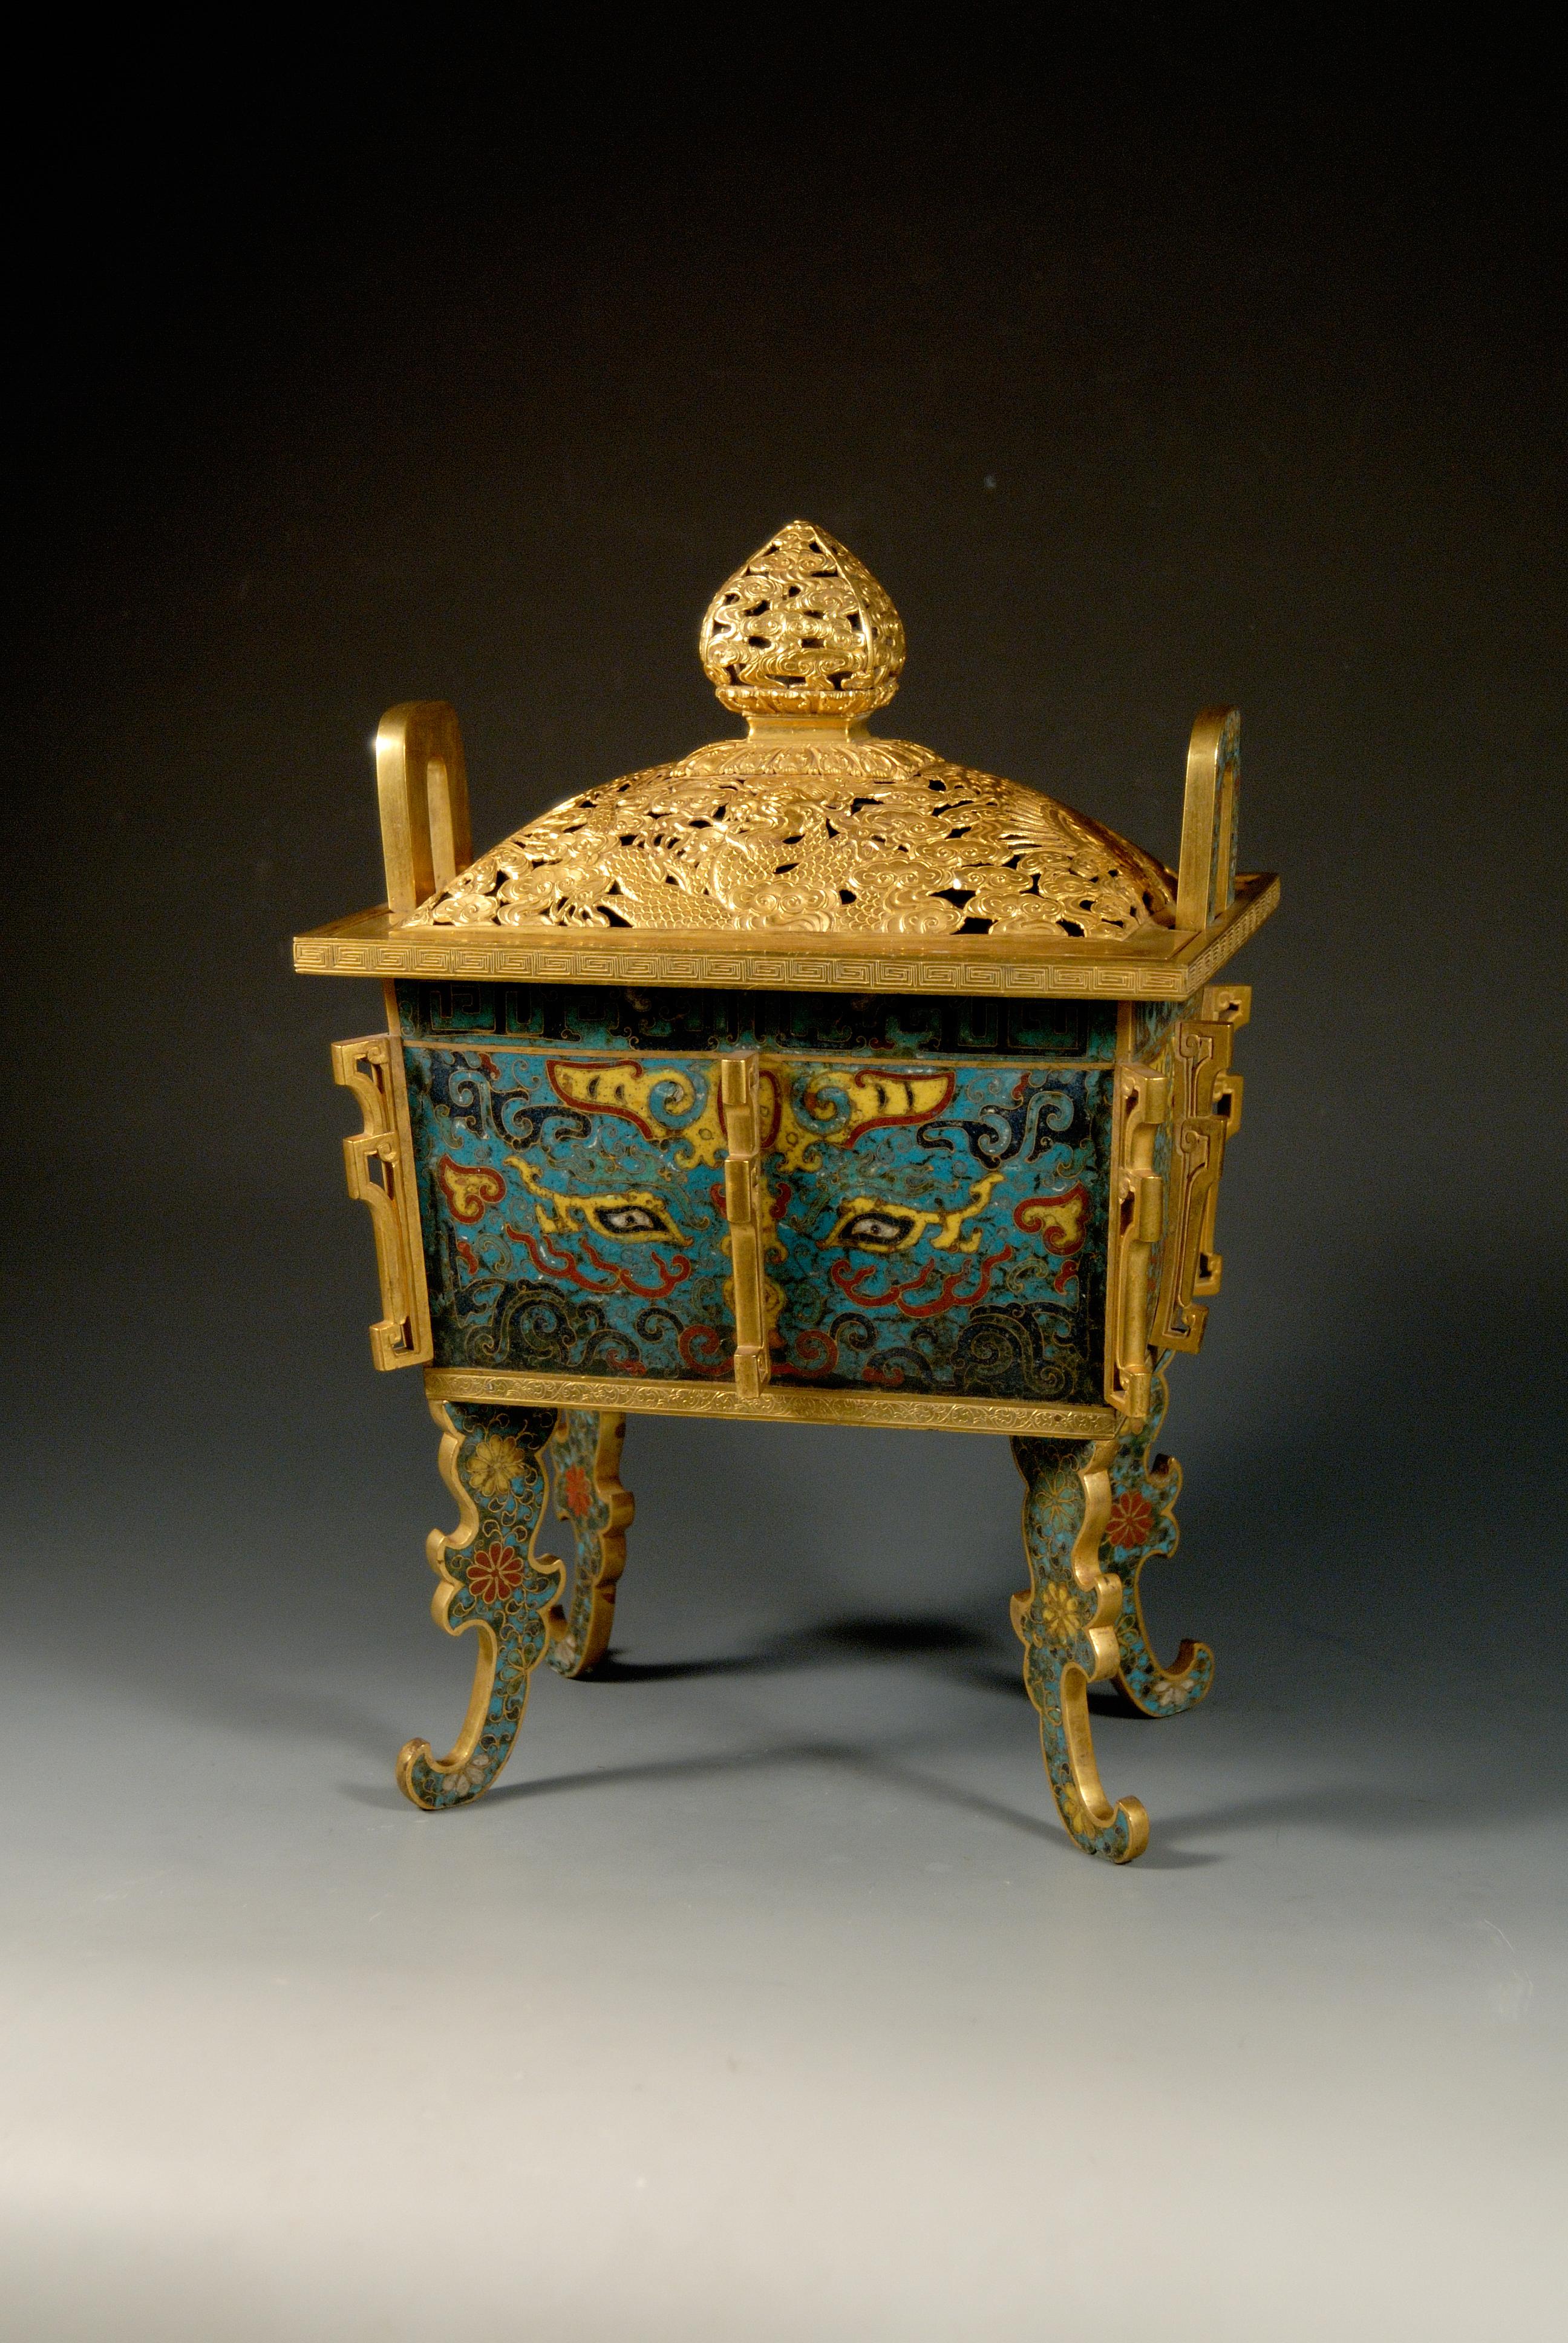 Gilded enamel stove. China, Ming Dynasty